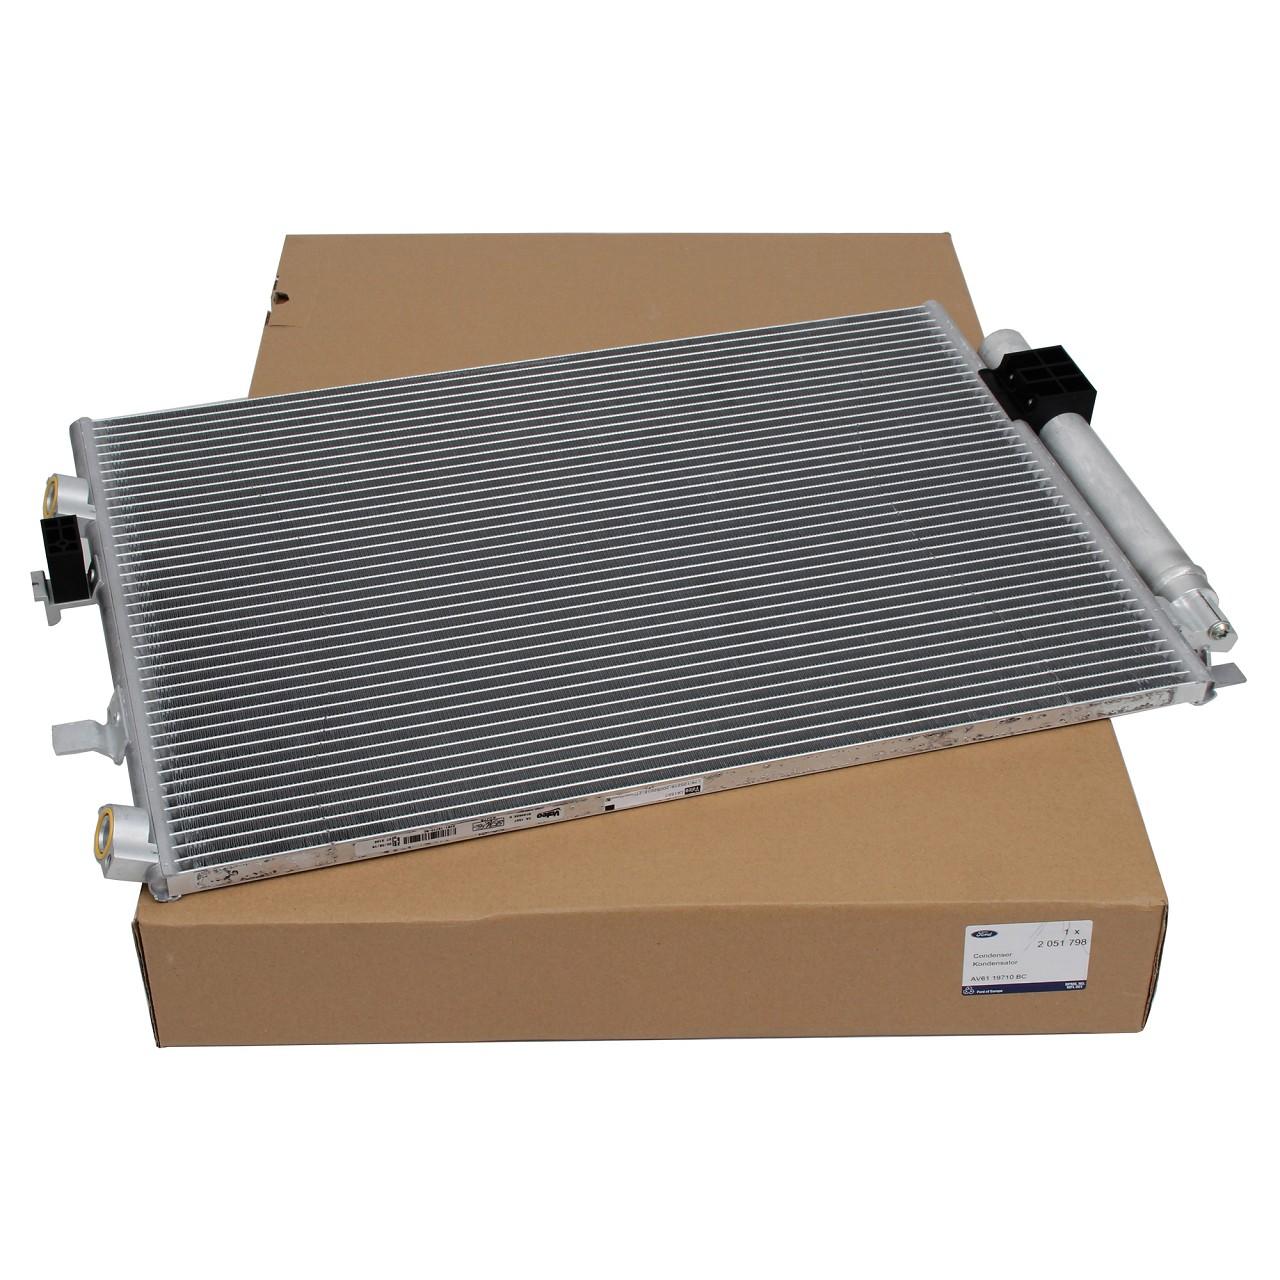 ORIGINAL Ford Kondensator Klimakondensator GRAND C-MAX C-MAX II 1.6TDCi 2051798